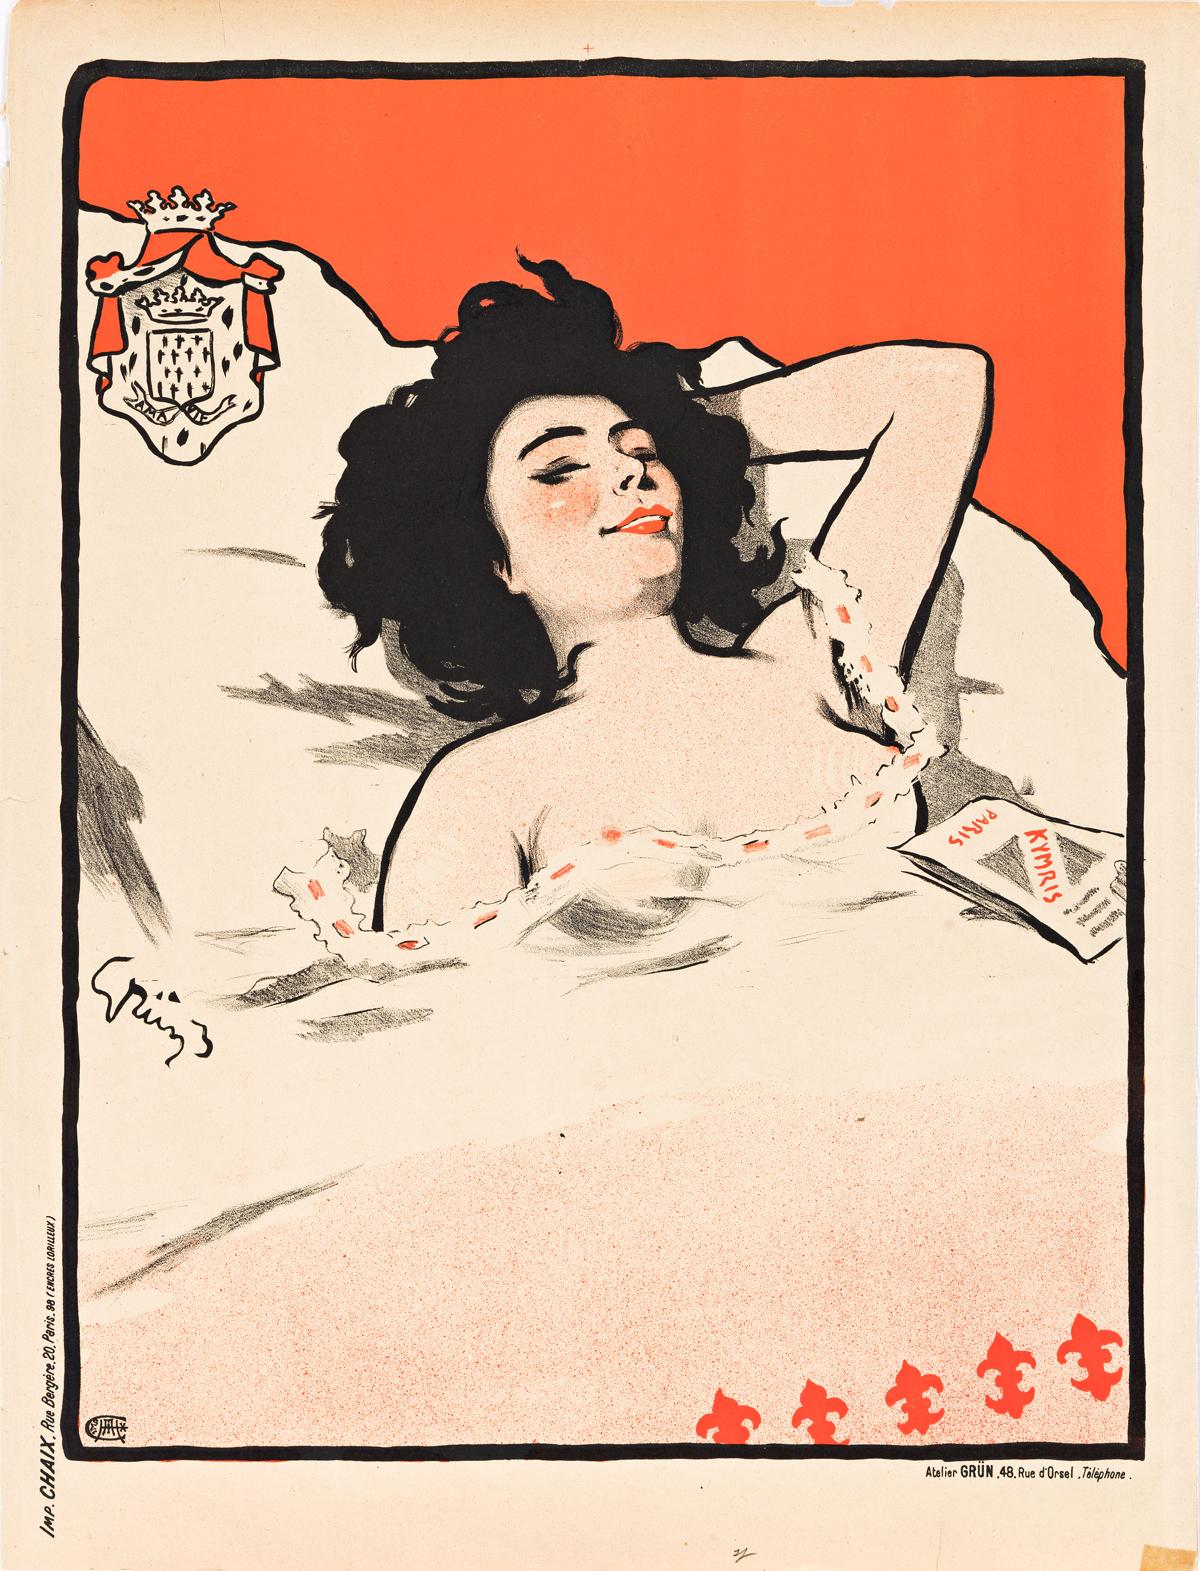 JULES-ALEXANDRE GRÜN (1868-1938) & JULES CHÉRET (1836-1932).  [ART NOUVEAU.] Group of 3 posters. Circa 1890s. Sizes vary, each approxim